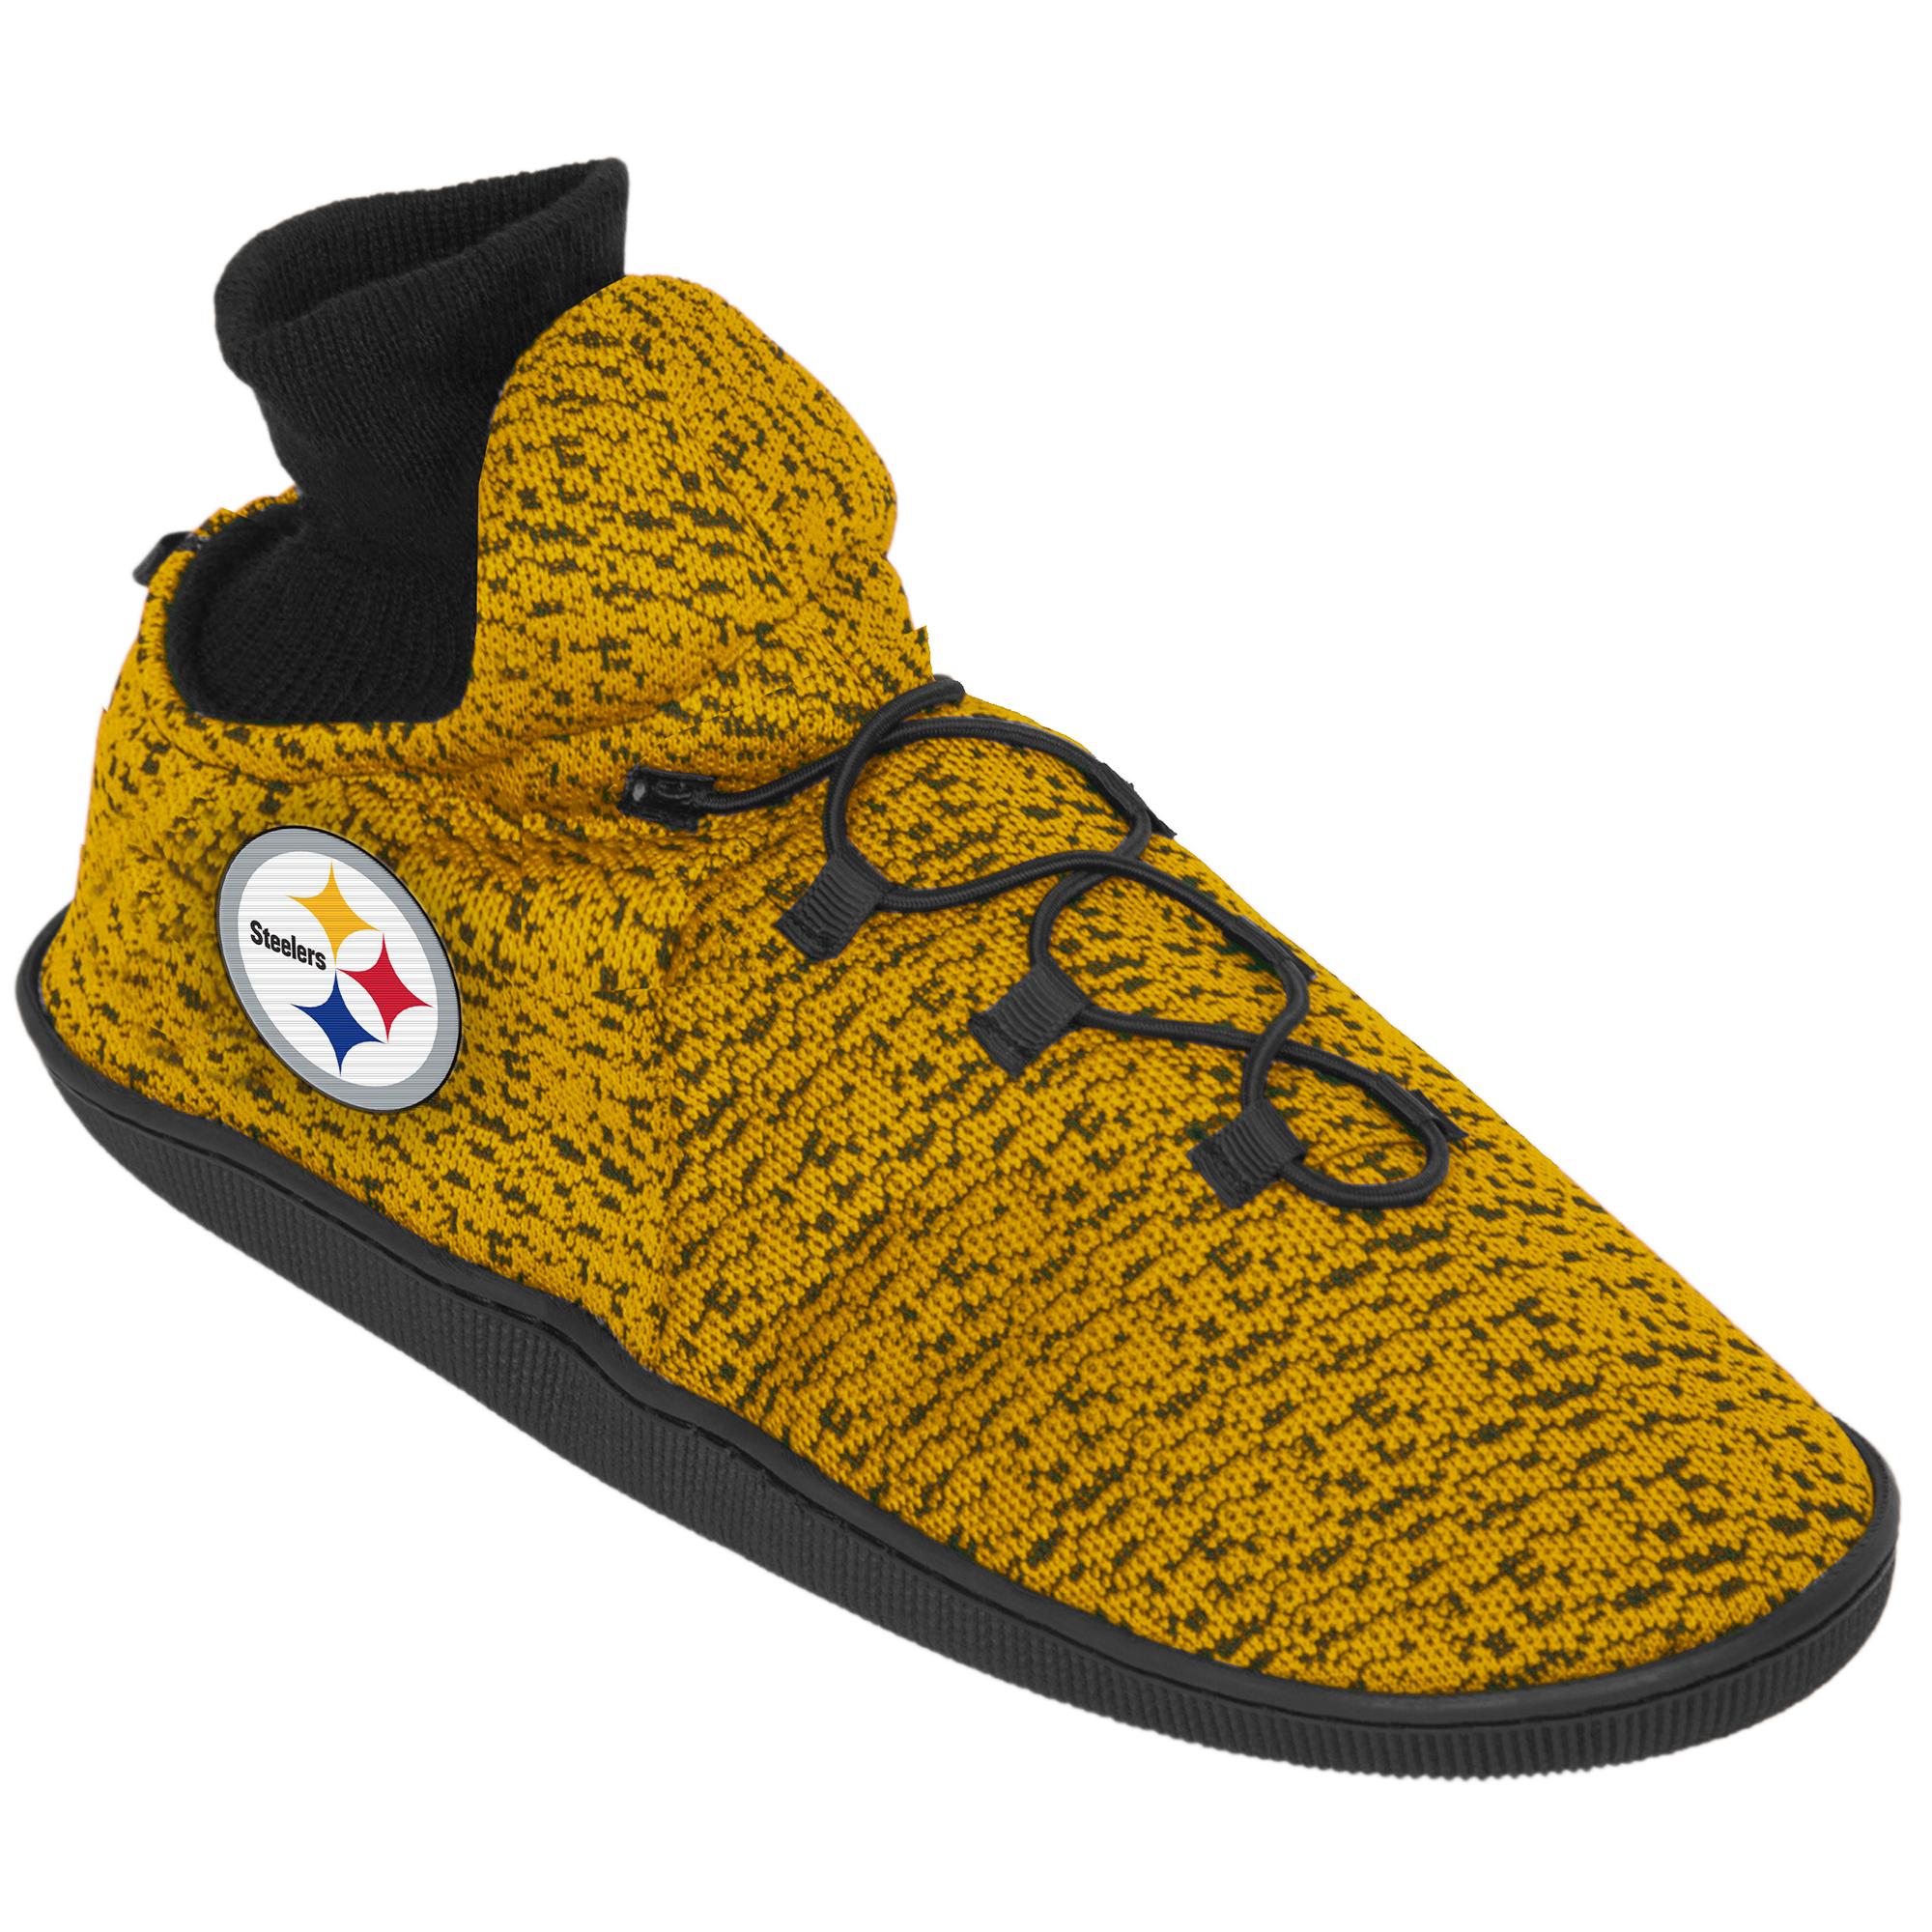 Pittsburgh Steelers Sneaker-Slippers aus Polyester-Strick – Herren